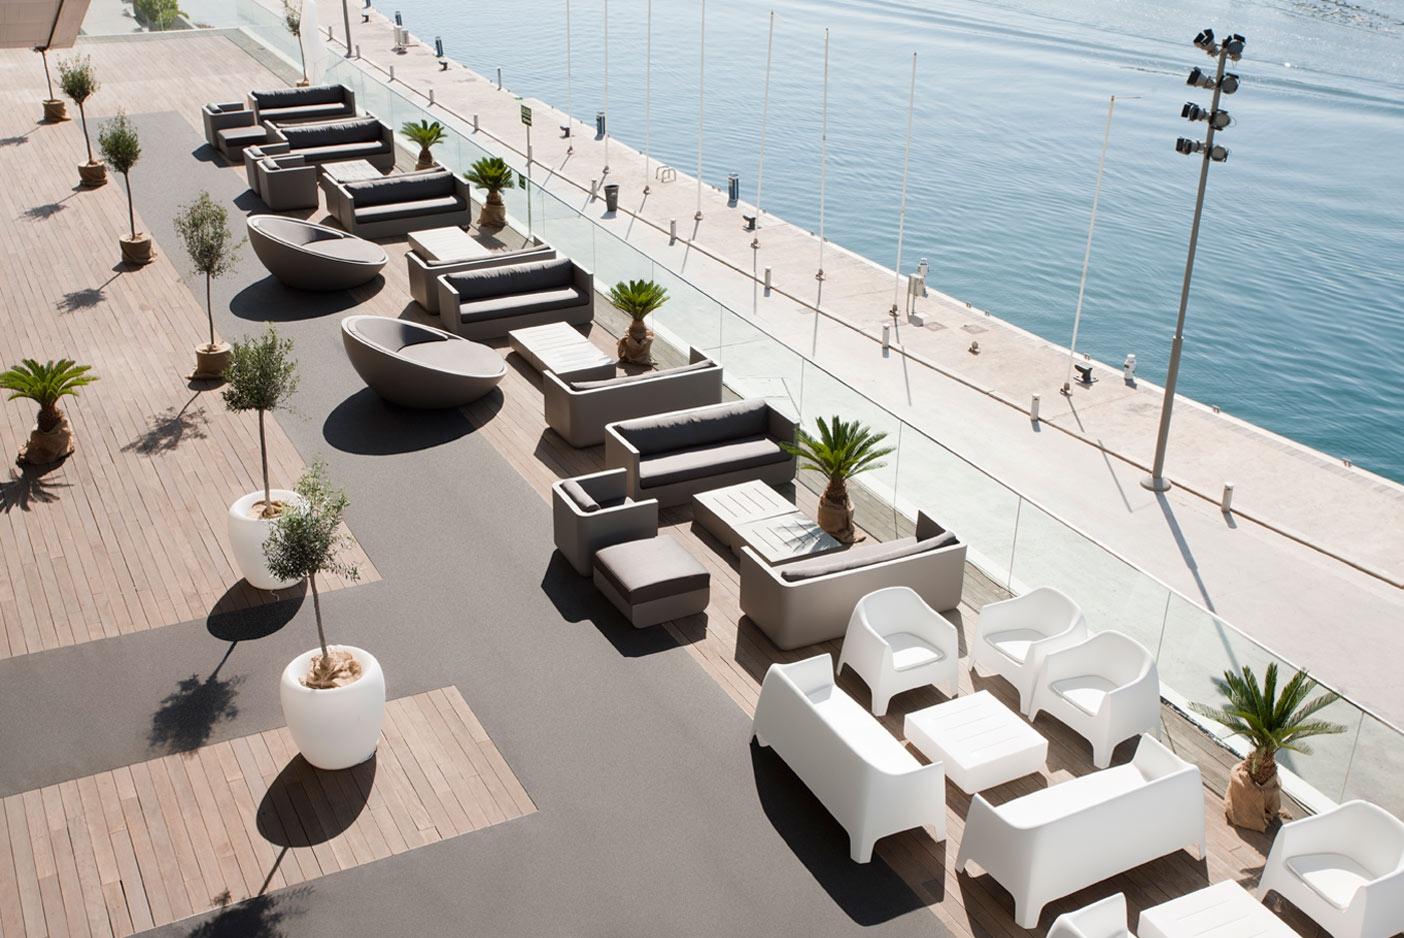 Ulm sofa outdoor polyethylene sofa with matt finish by vondom for Designhotel ulm